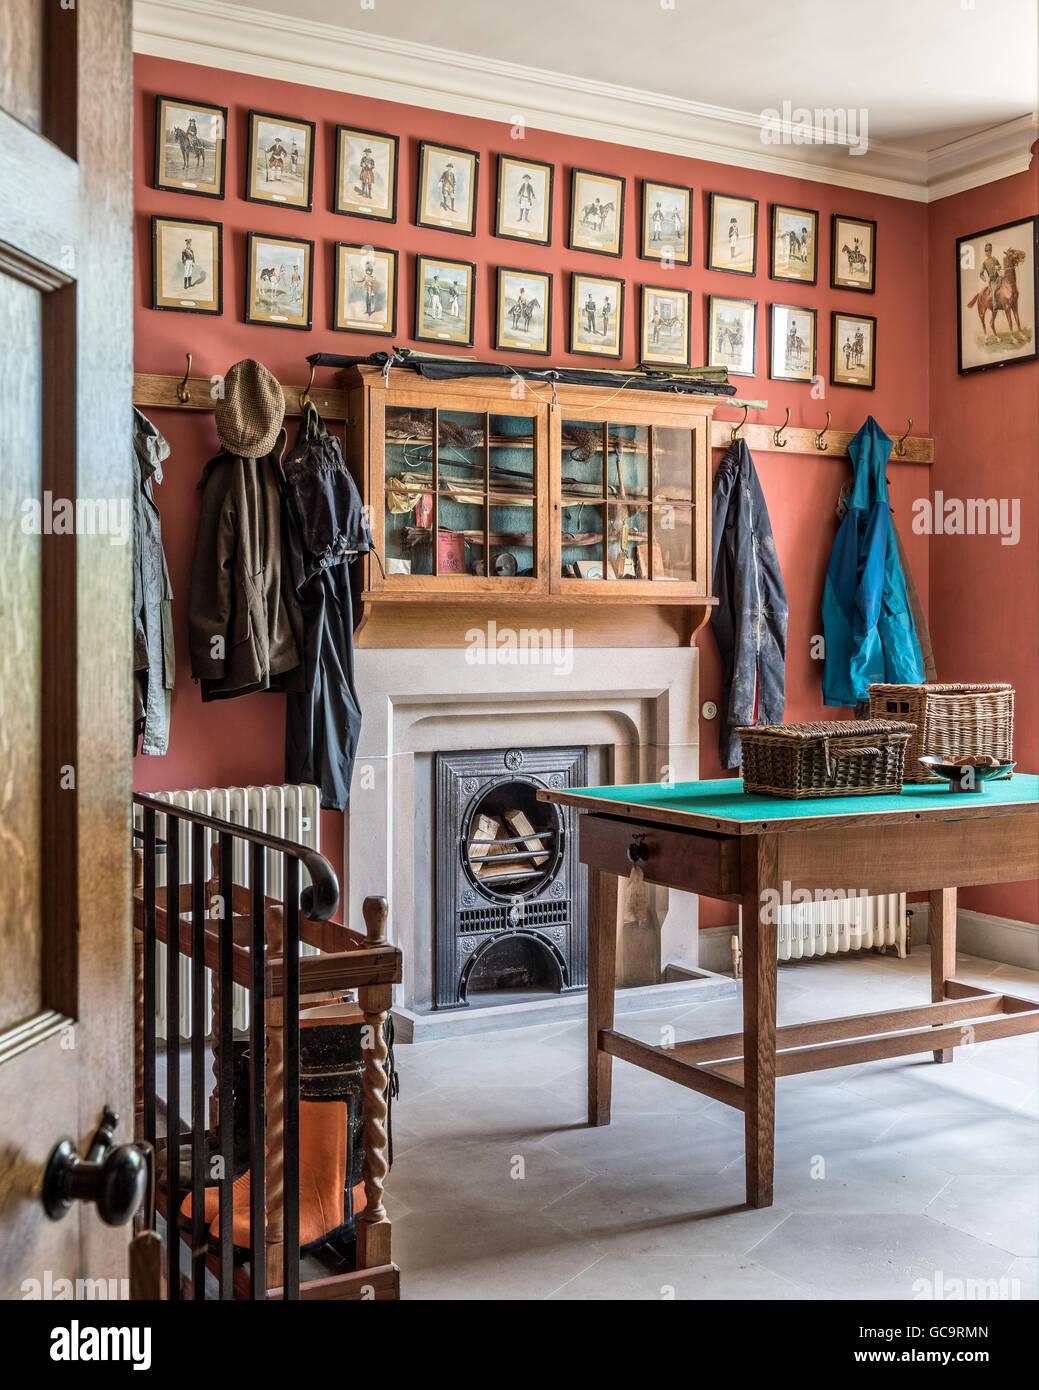 Coat Hooks Stockfotos & Coat Hooks Bilder - Alamy